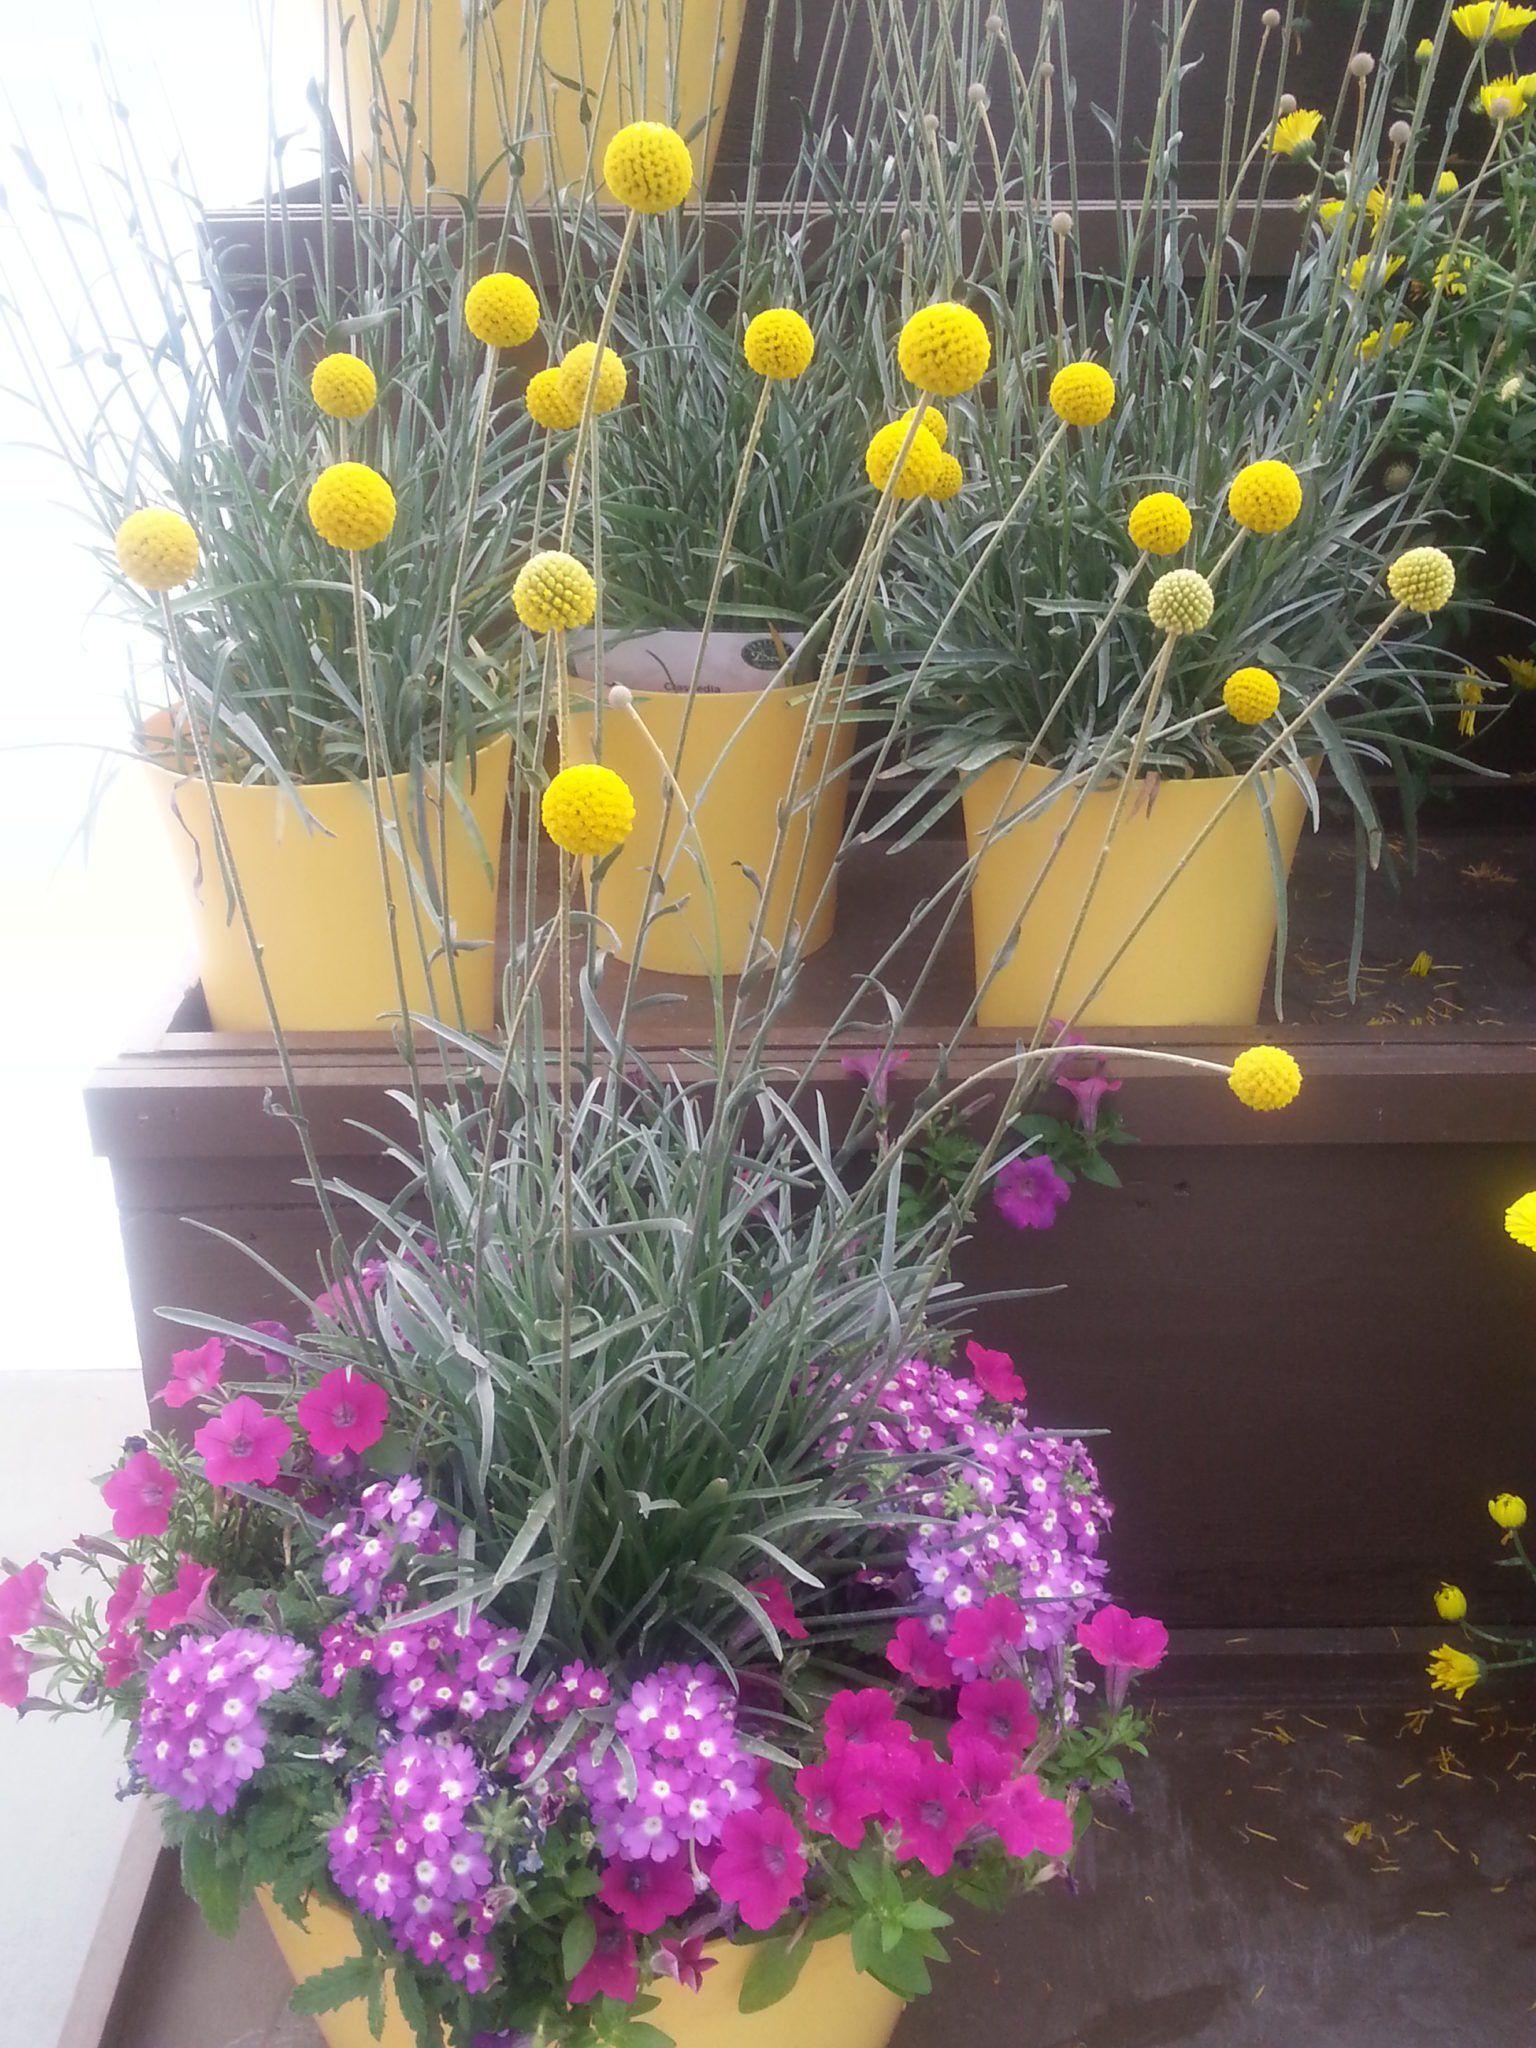 Craspedia Golf Beauty Gardening In The Shade Beauty Gardens Flower Pots Craspedia